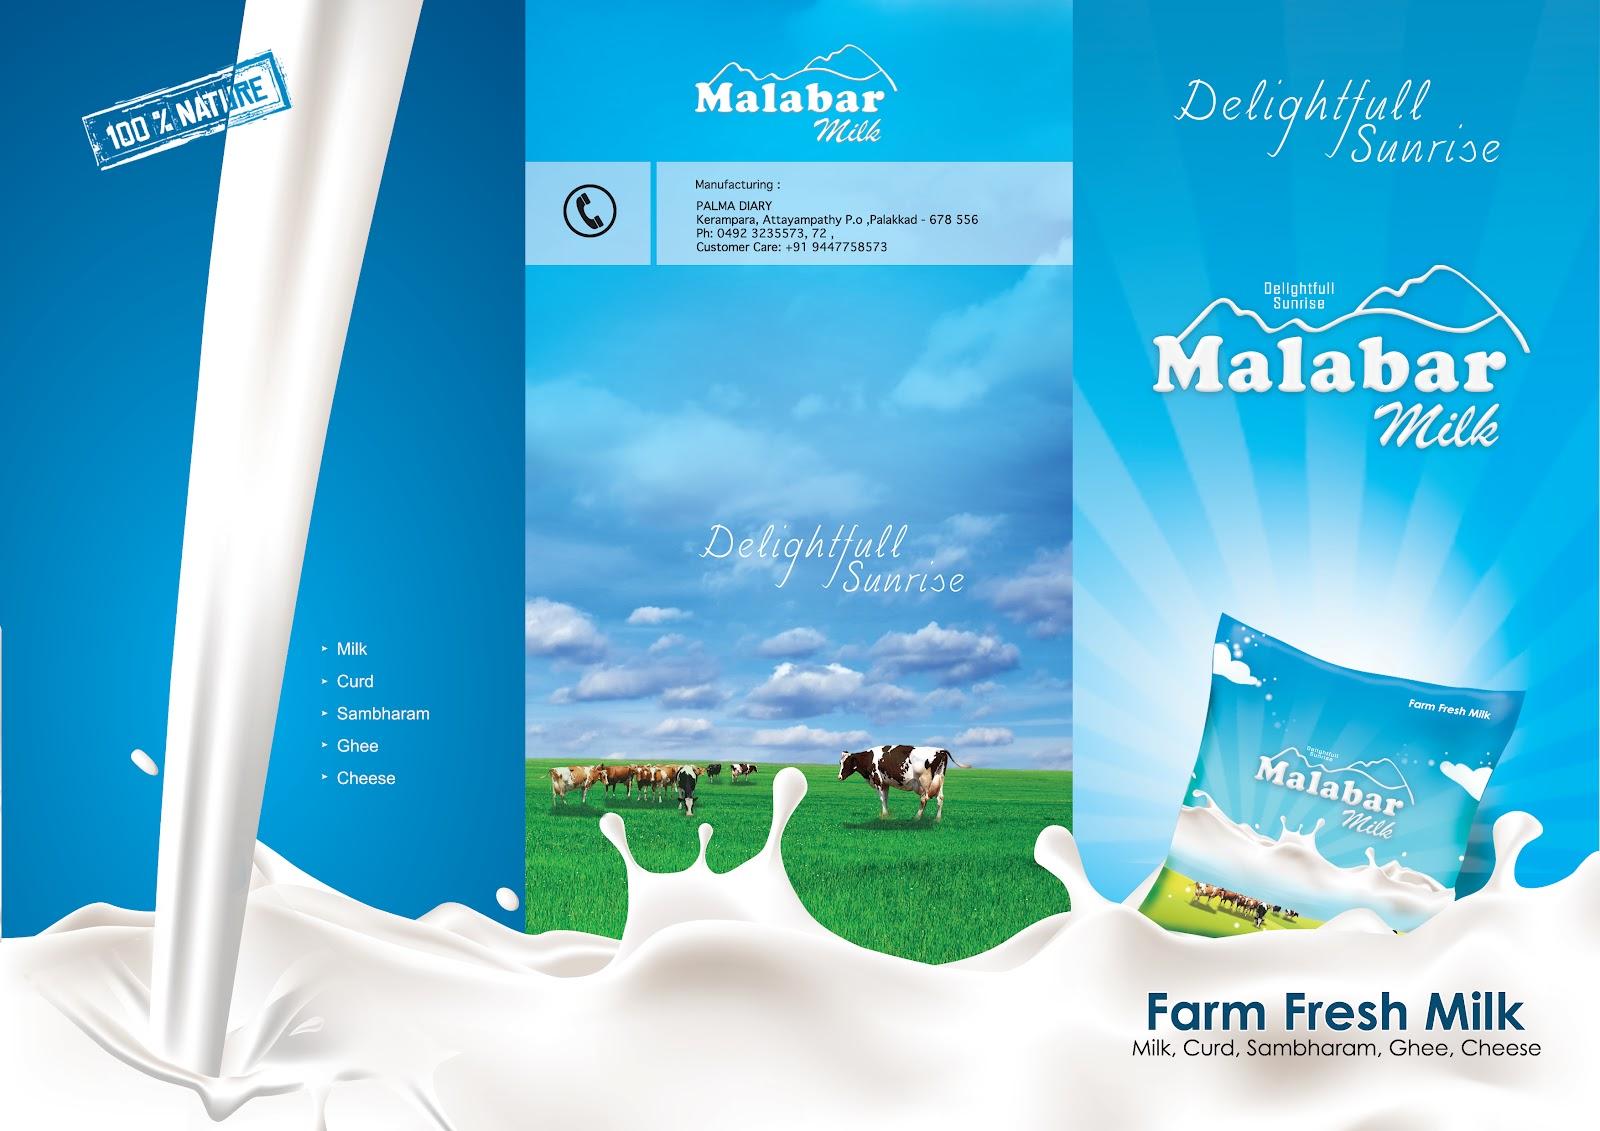 MALABAR MILK brochure | Graphic / Web Designer: shafeemind.blogspot.com/2012/07/malabar-milk-brochure.html#!